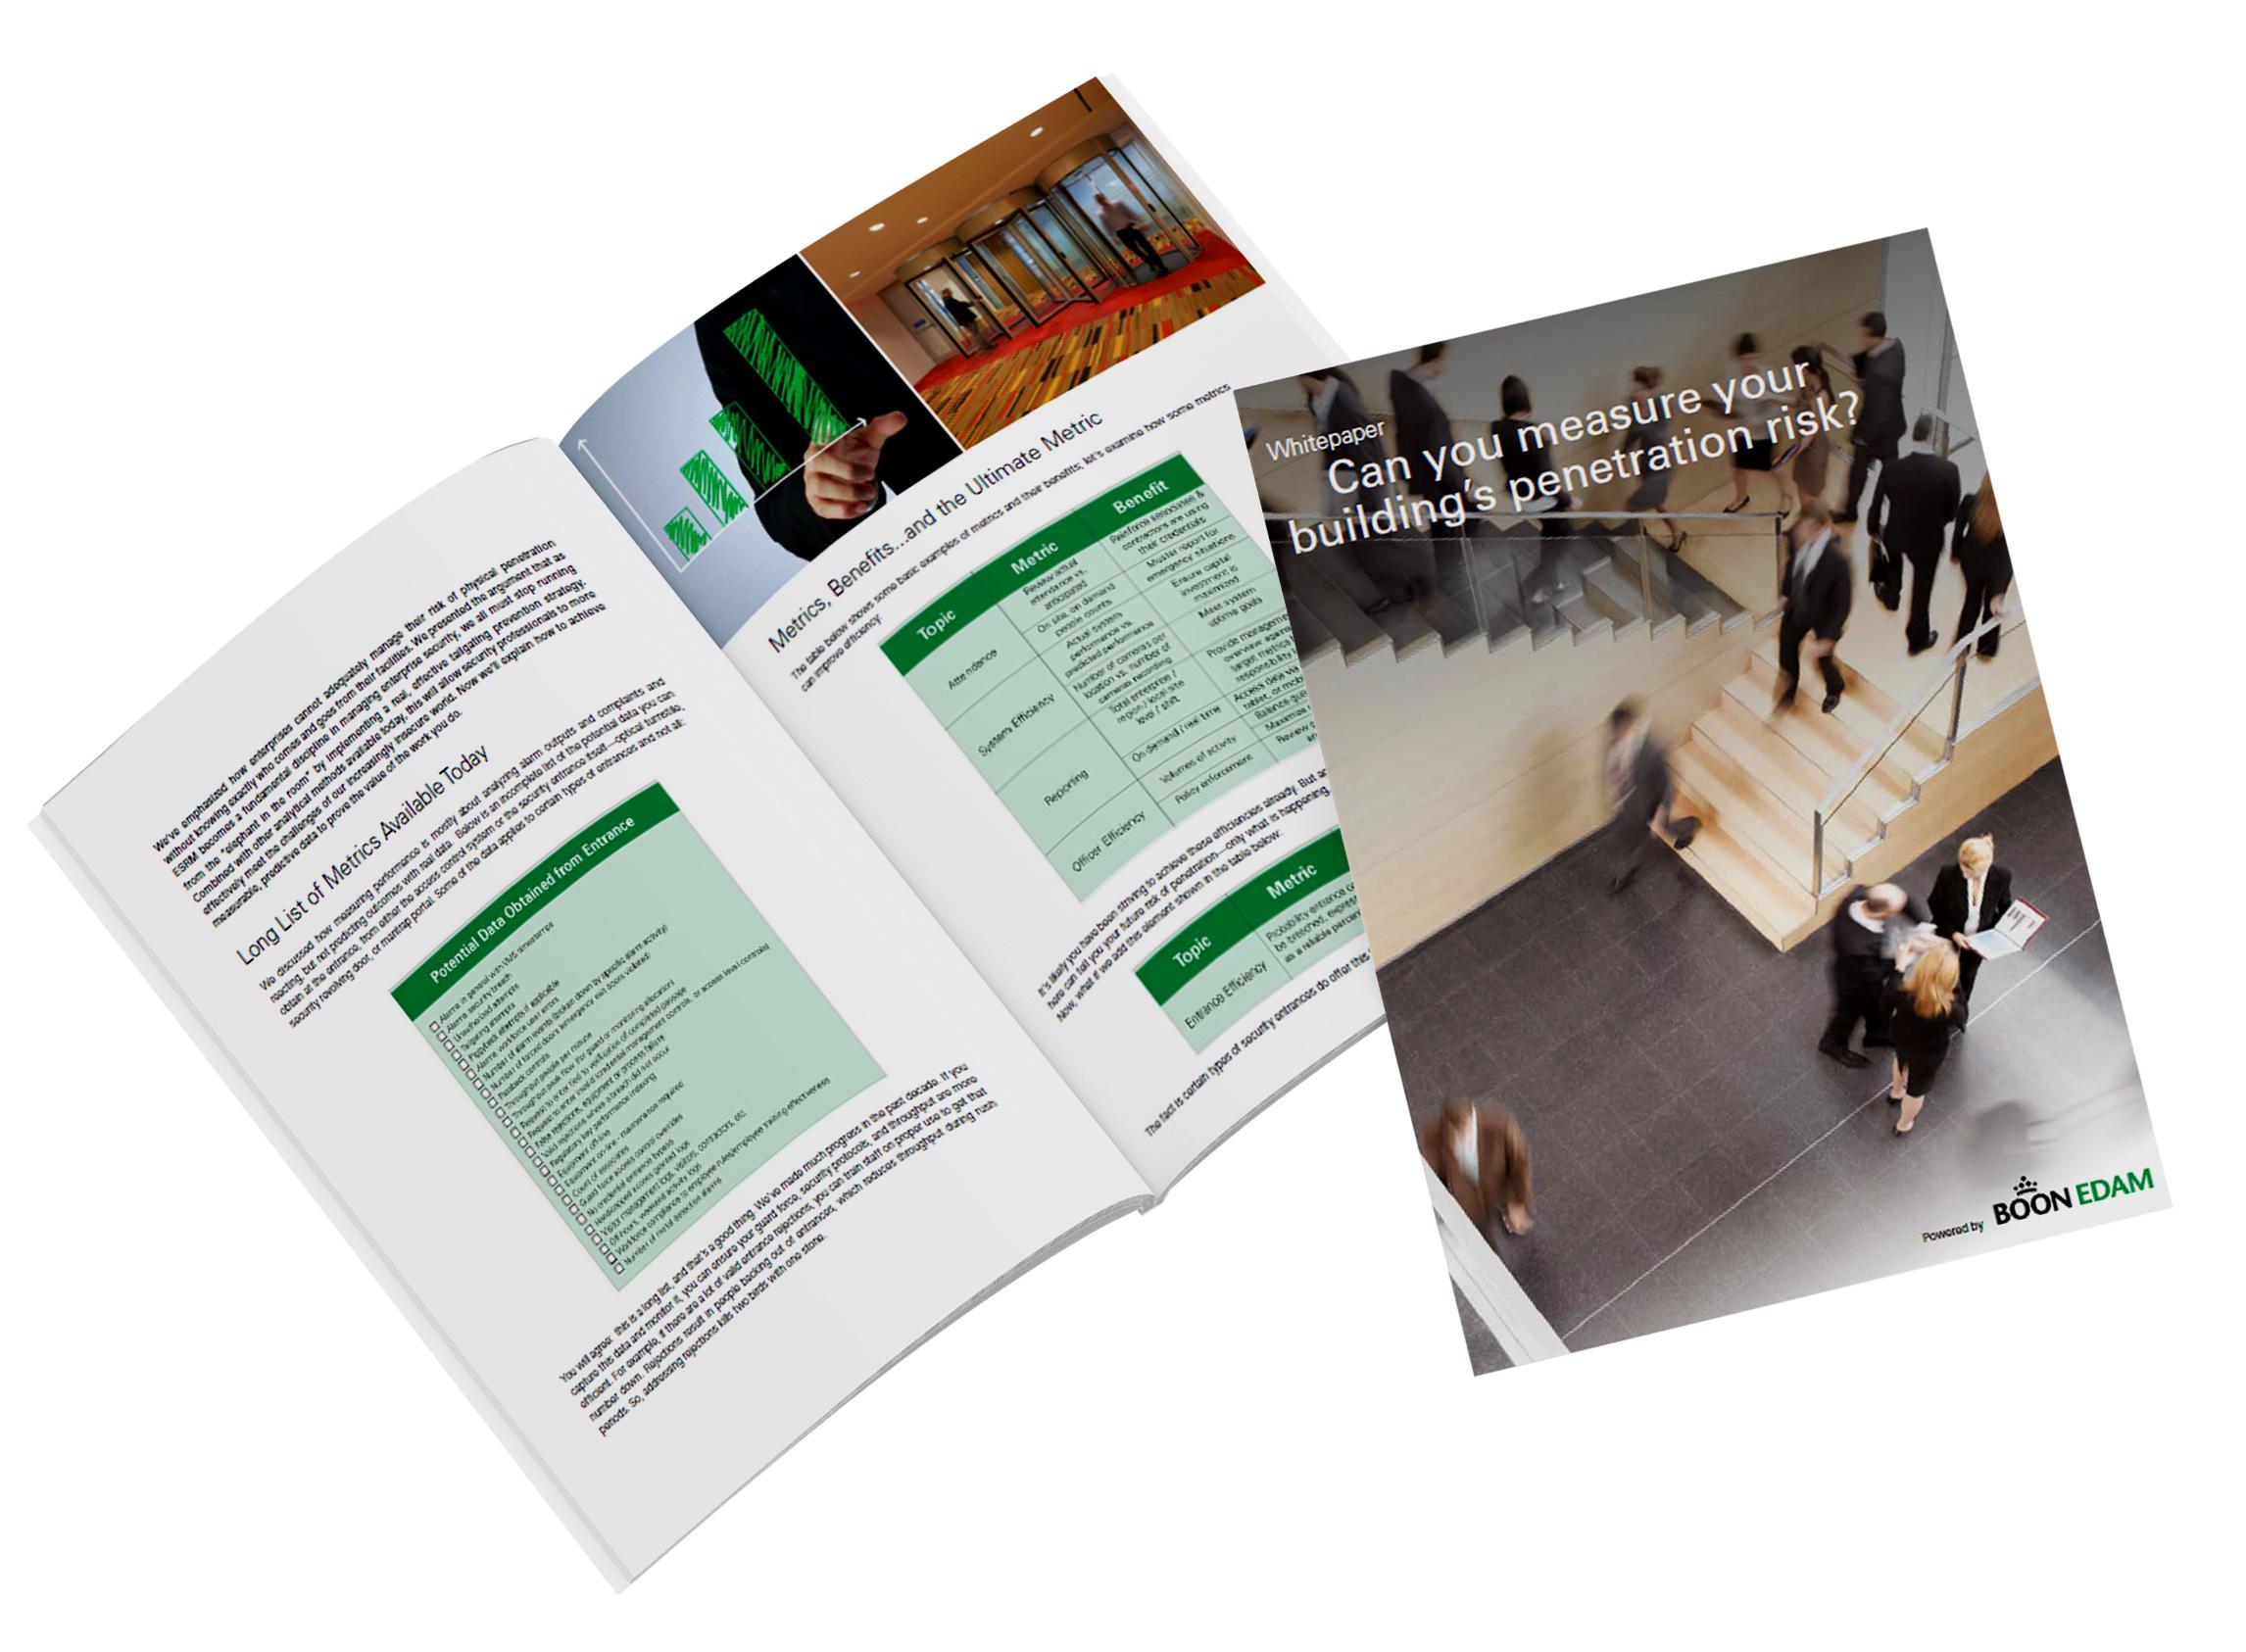 01_LP_Whitepaper_Can you measure your buildings penetration risk.jpg